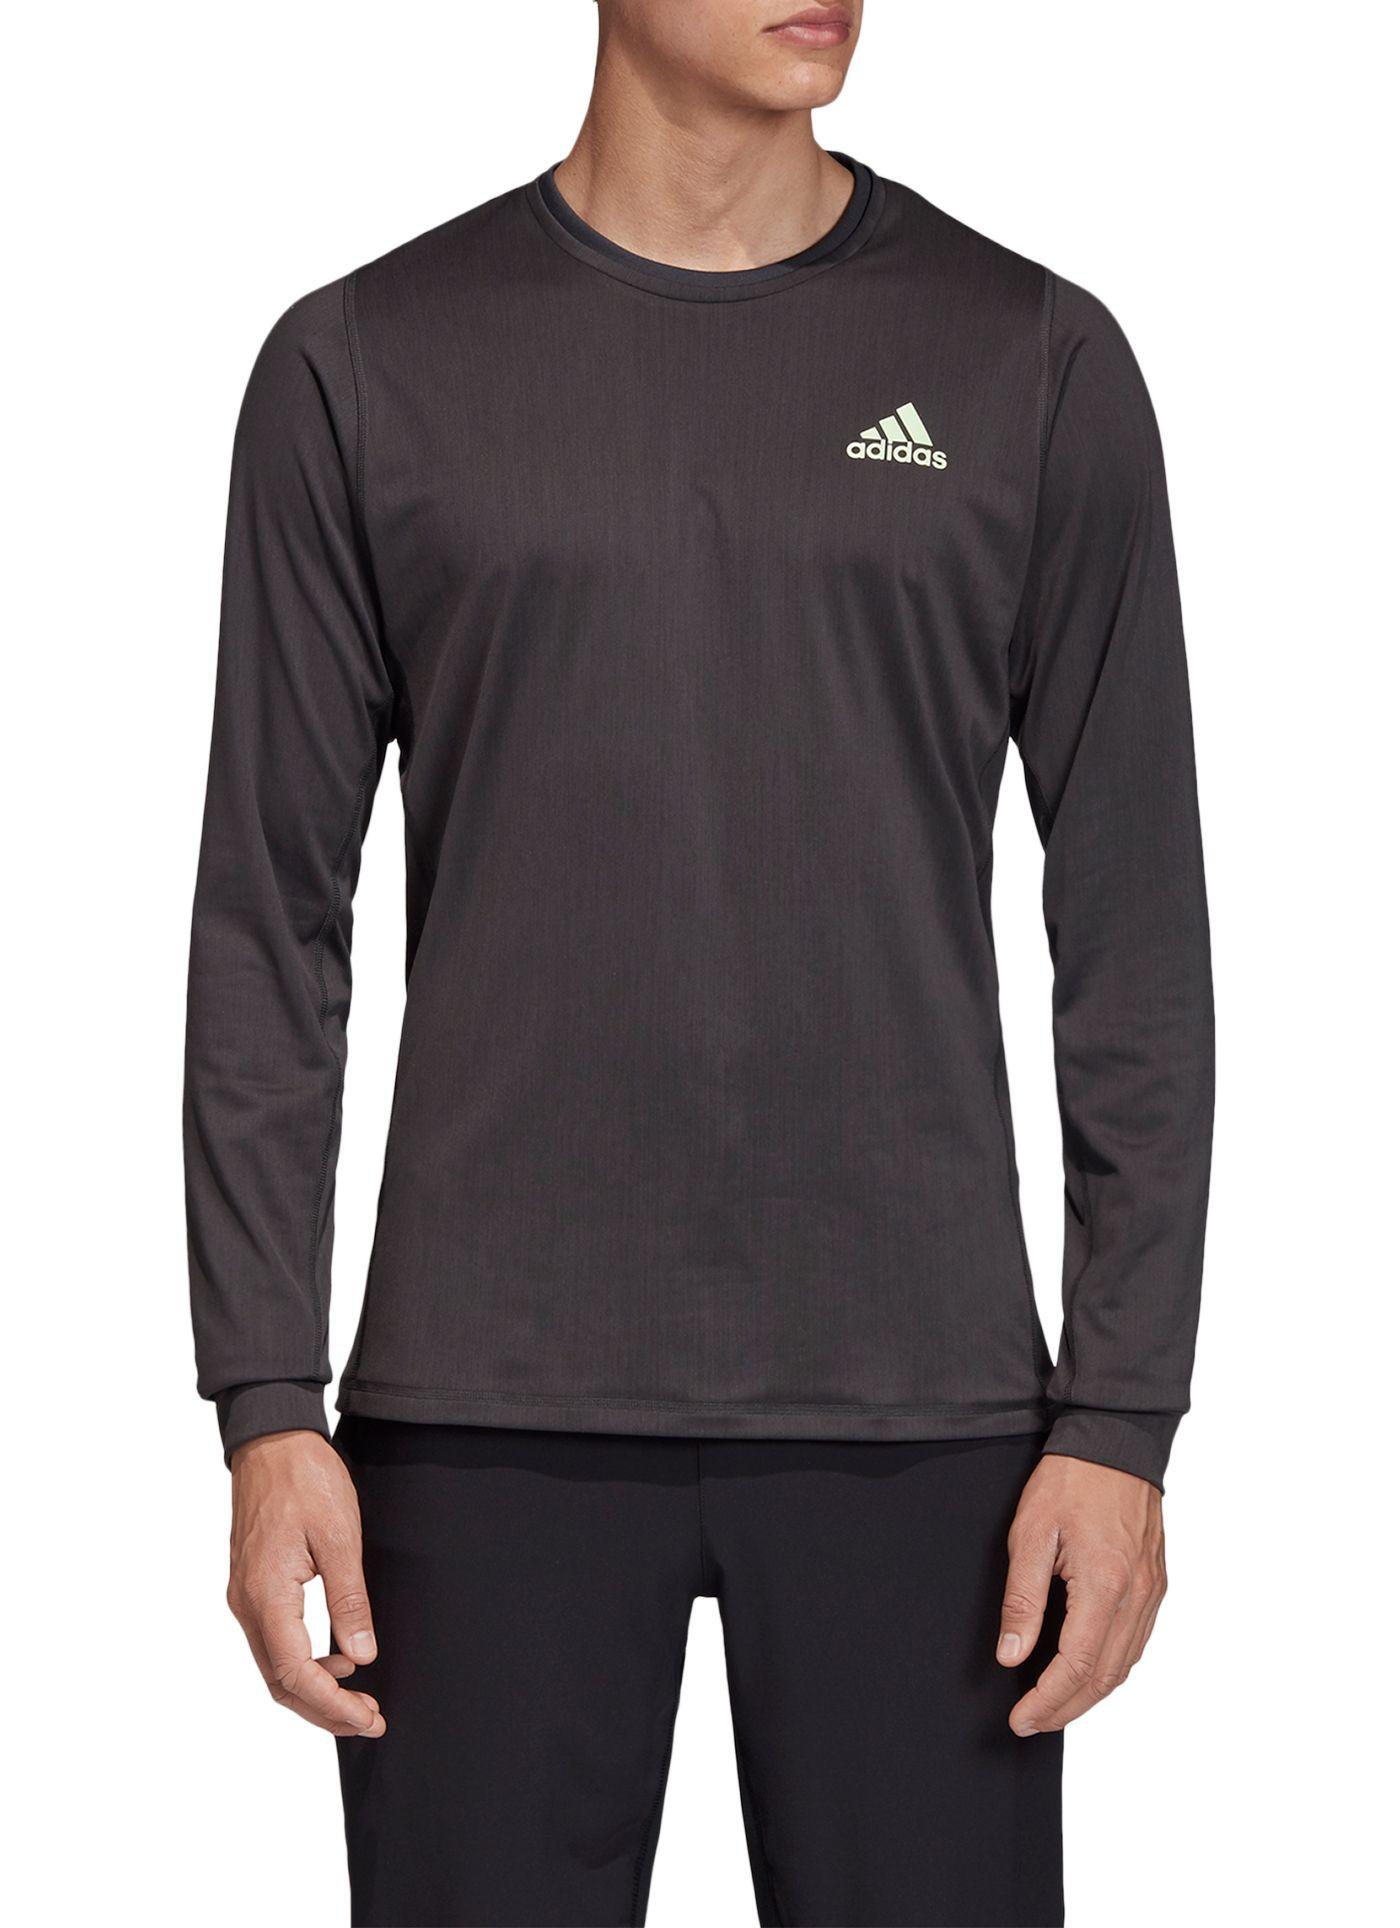 adidas Men's New York Long Sleeve Tennis T-Shirt